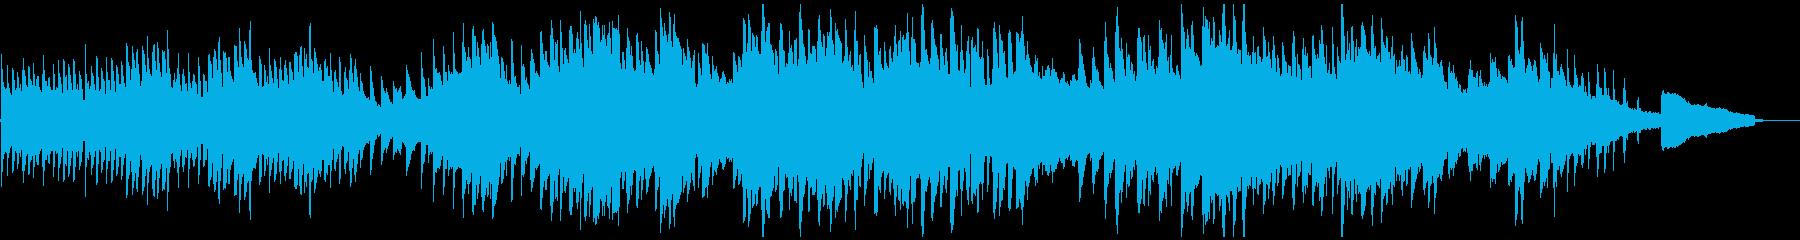 Cinematic Piano 11の再生済みの波形